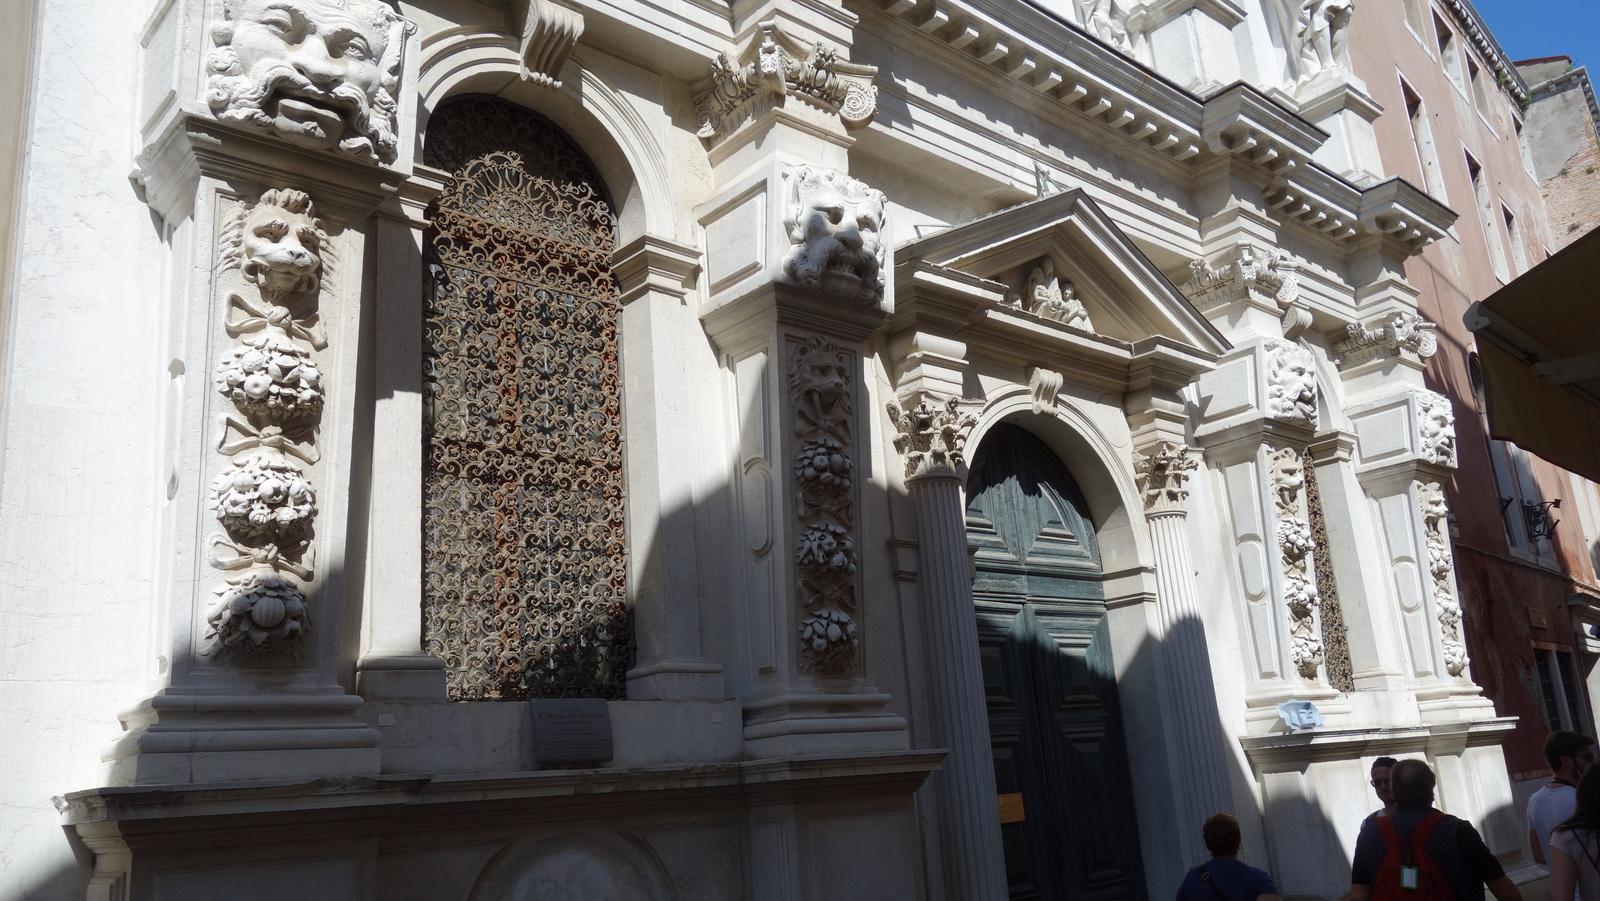 061 - Verso San Francesco della Vigna